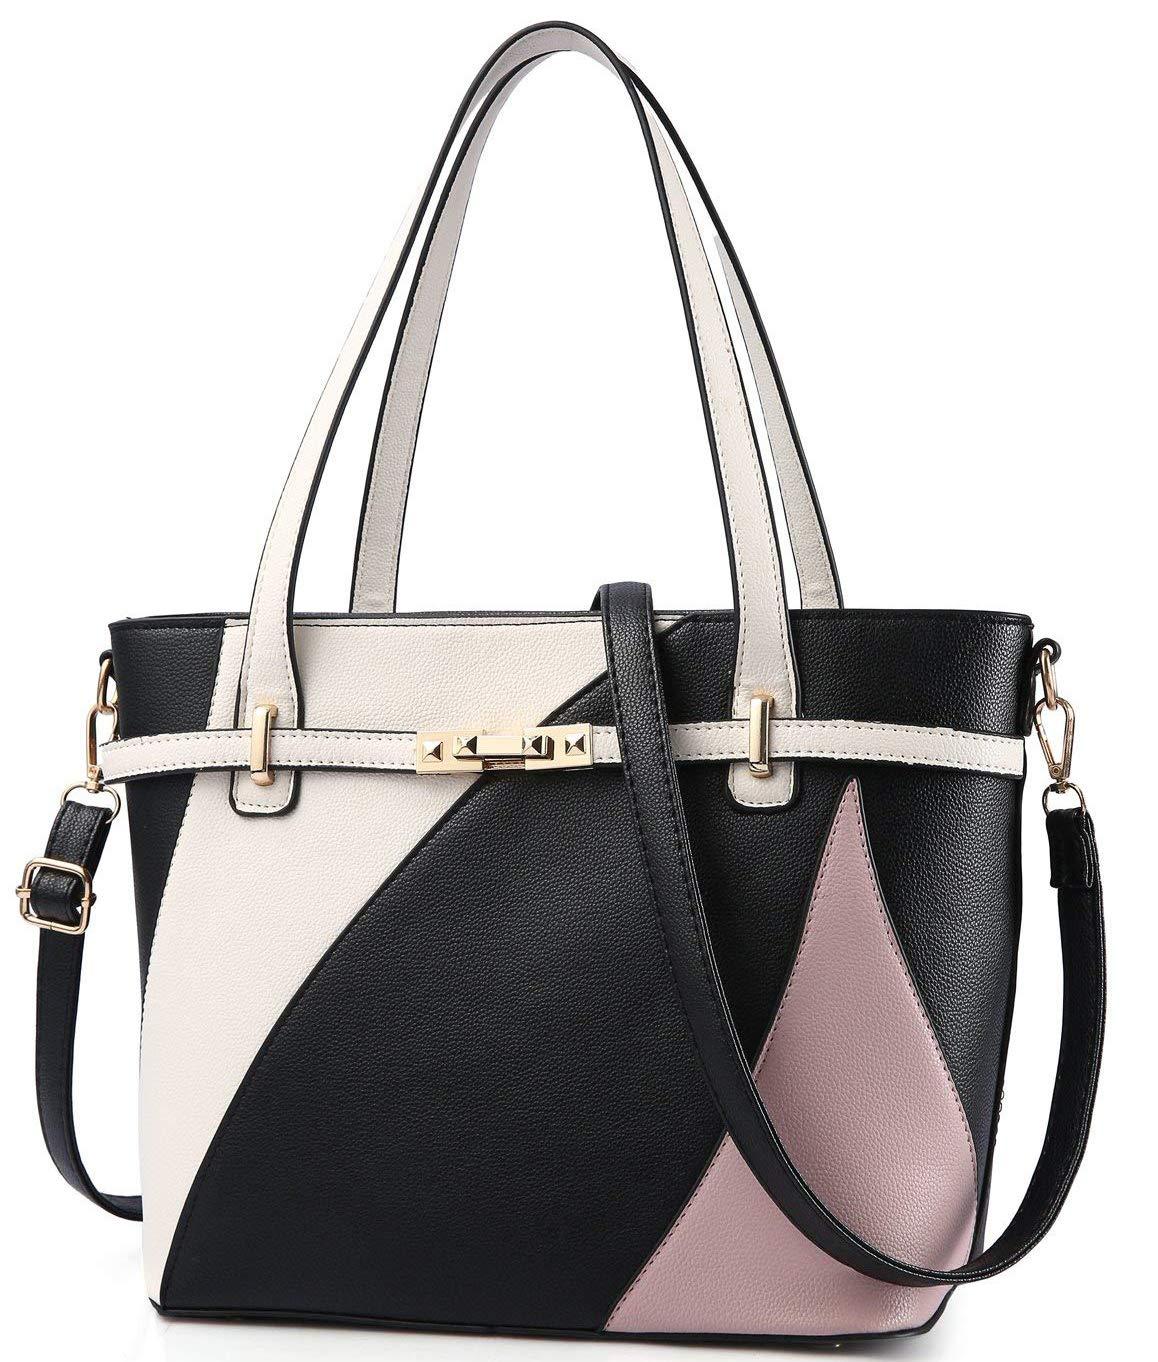 Black Handbags for Women Shoulder Tote Bags Satchel Purse Top Handle Designer Leather Ladies Cossbody Bag